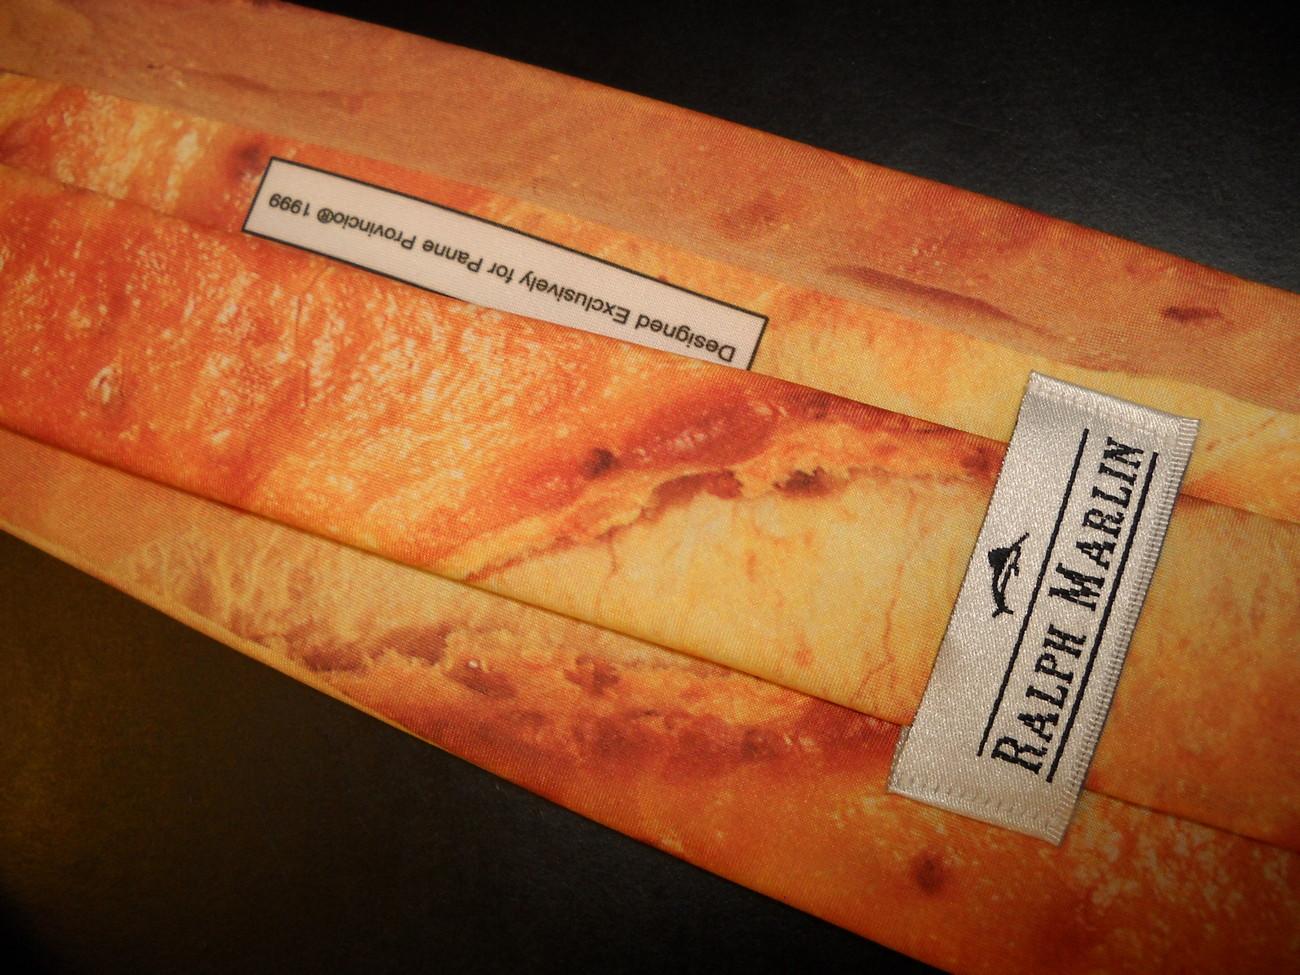 Ralph Marlin Neck Tie Panne Provincio One Long Fresh Baked Crusty Baguette Look